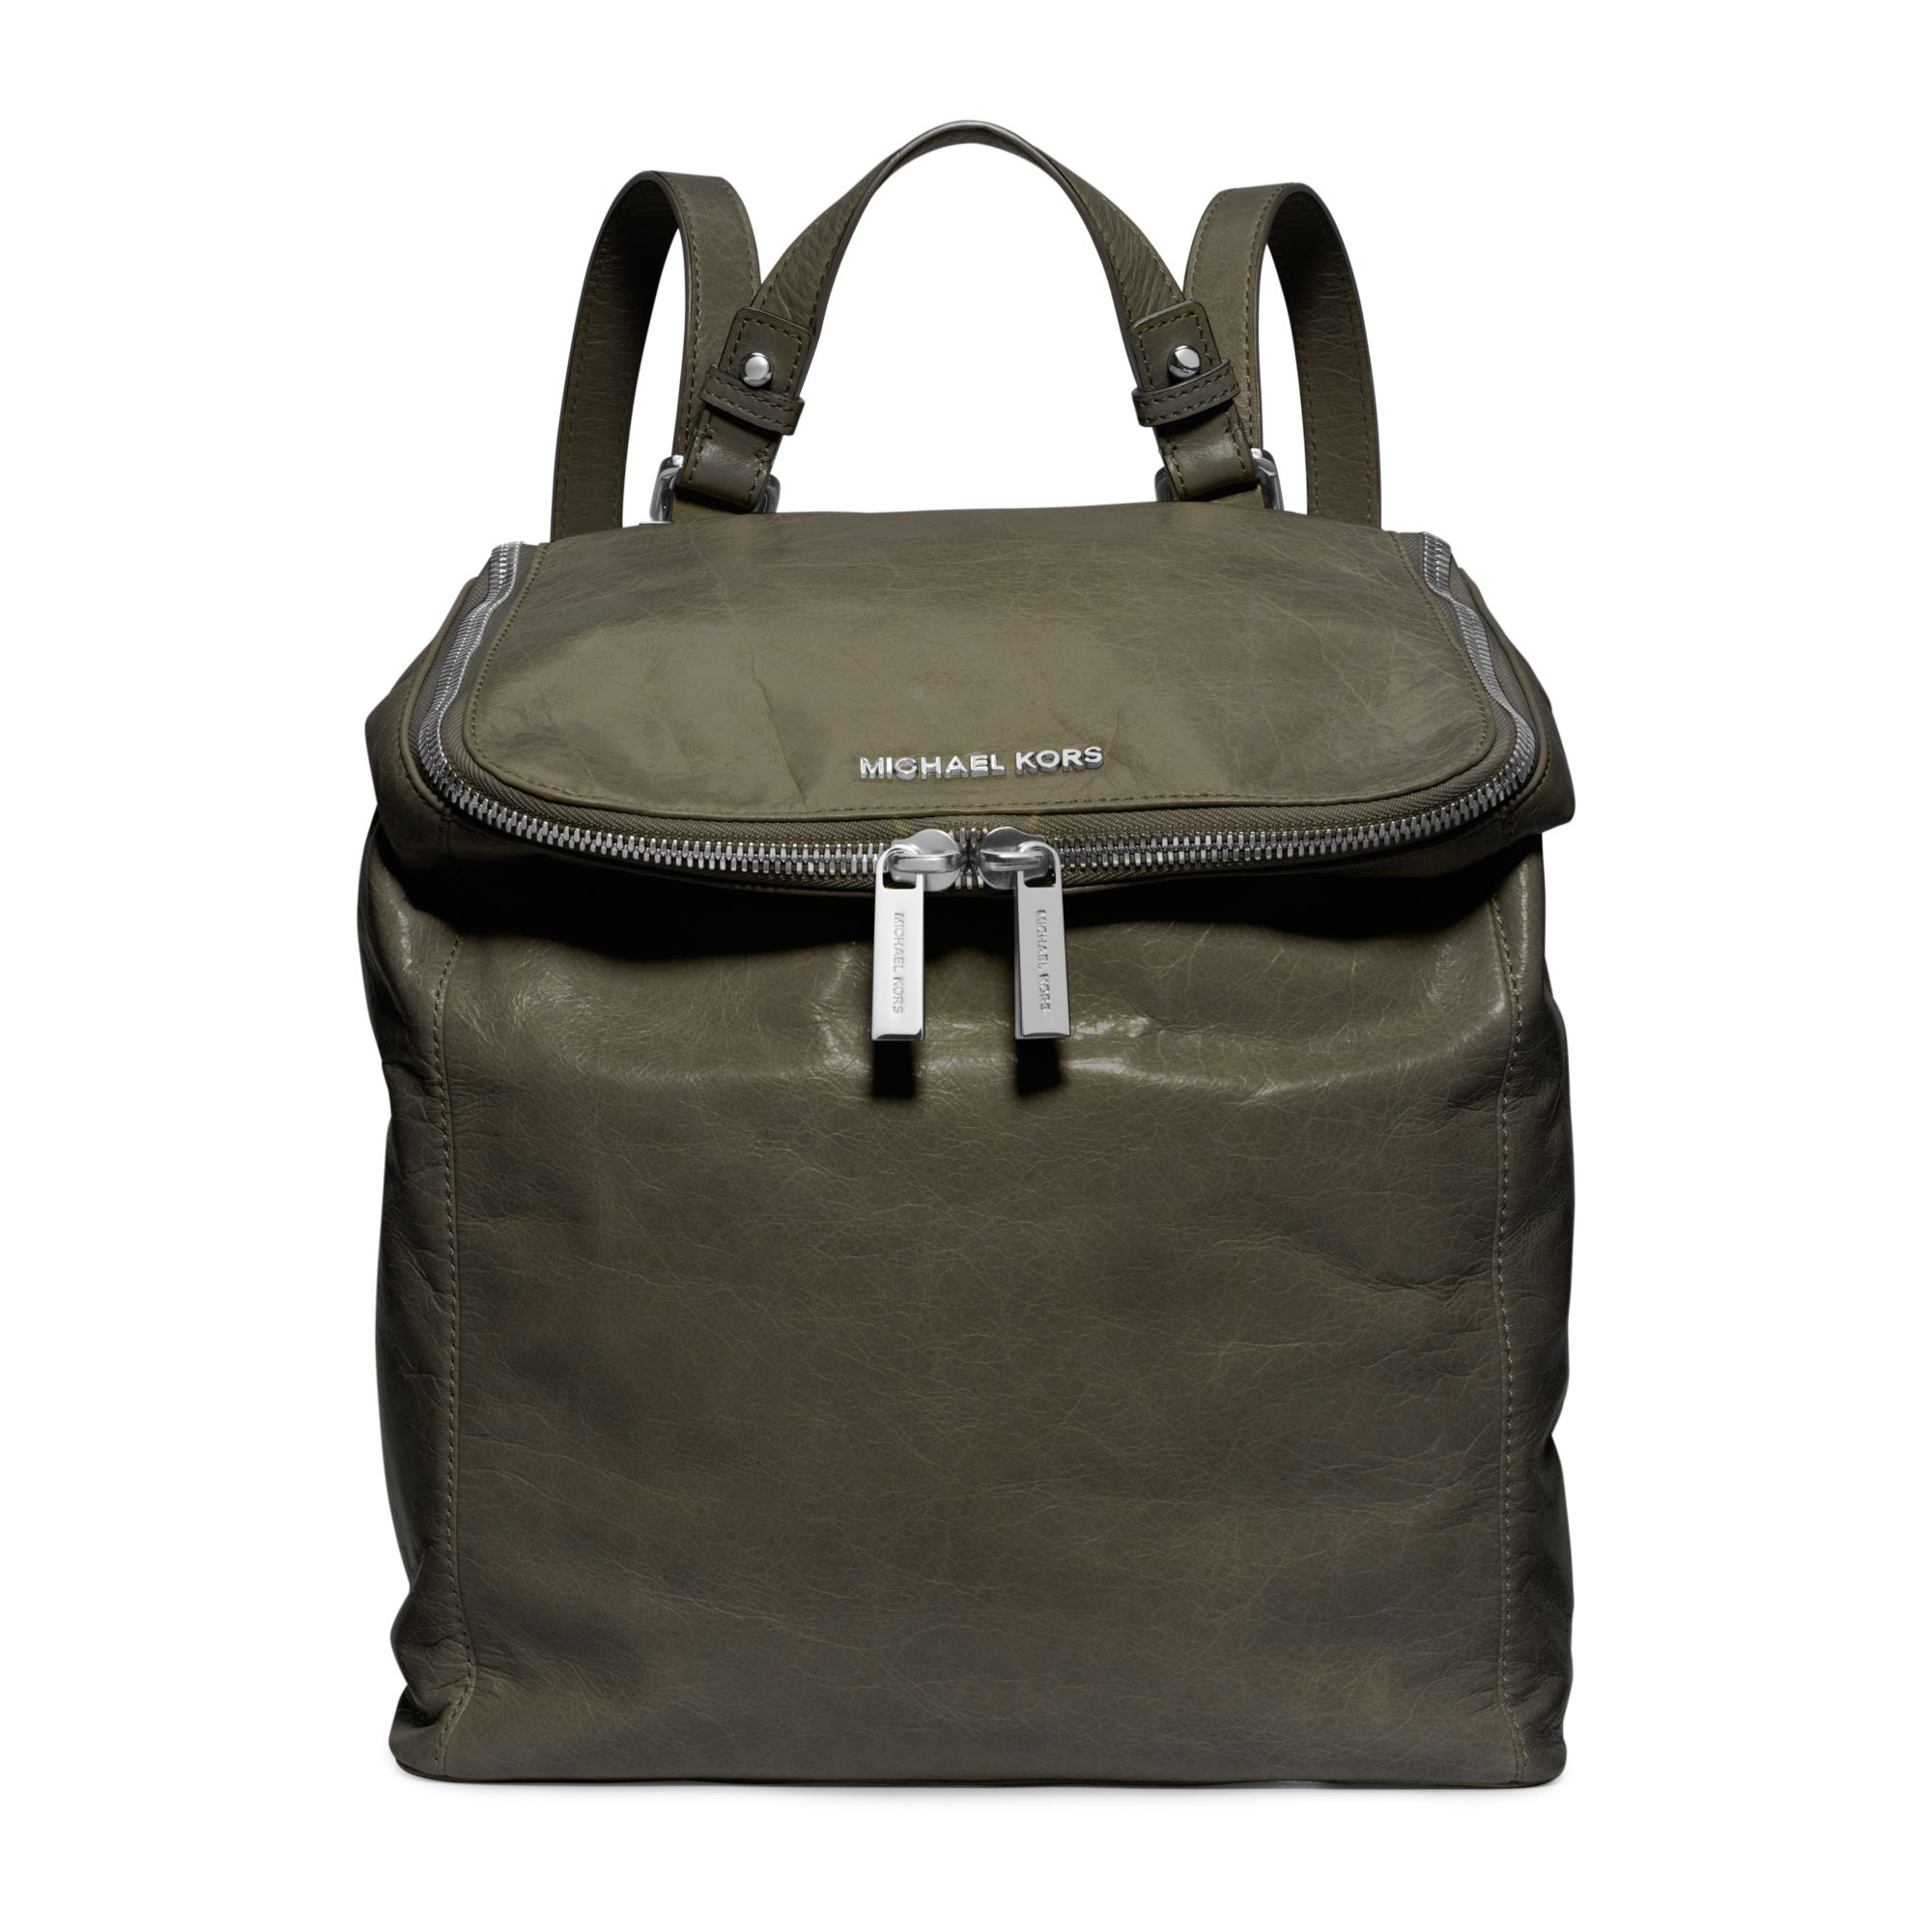 michael kors lisbeth leather medium backpack in green lyst. Black Bedroom Furniture Sets. Home Design Ideas